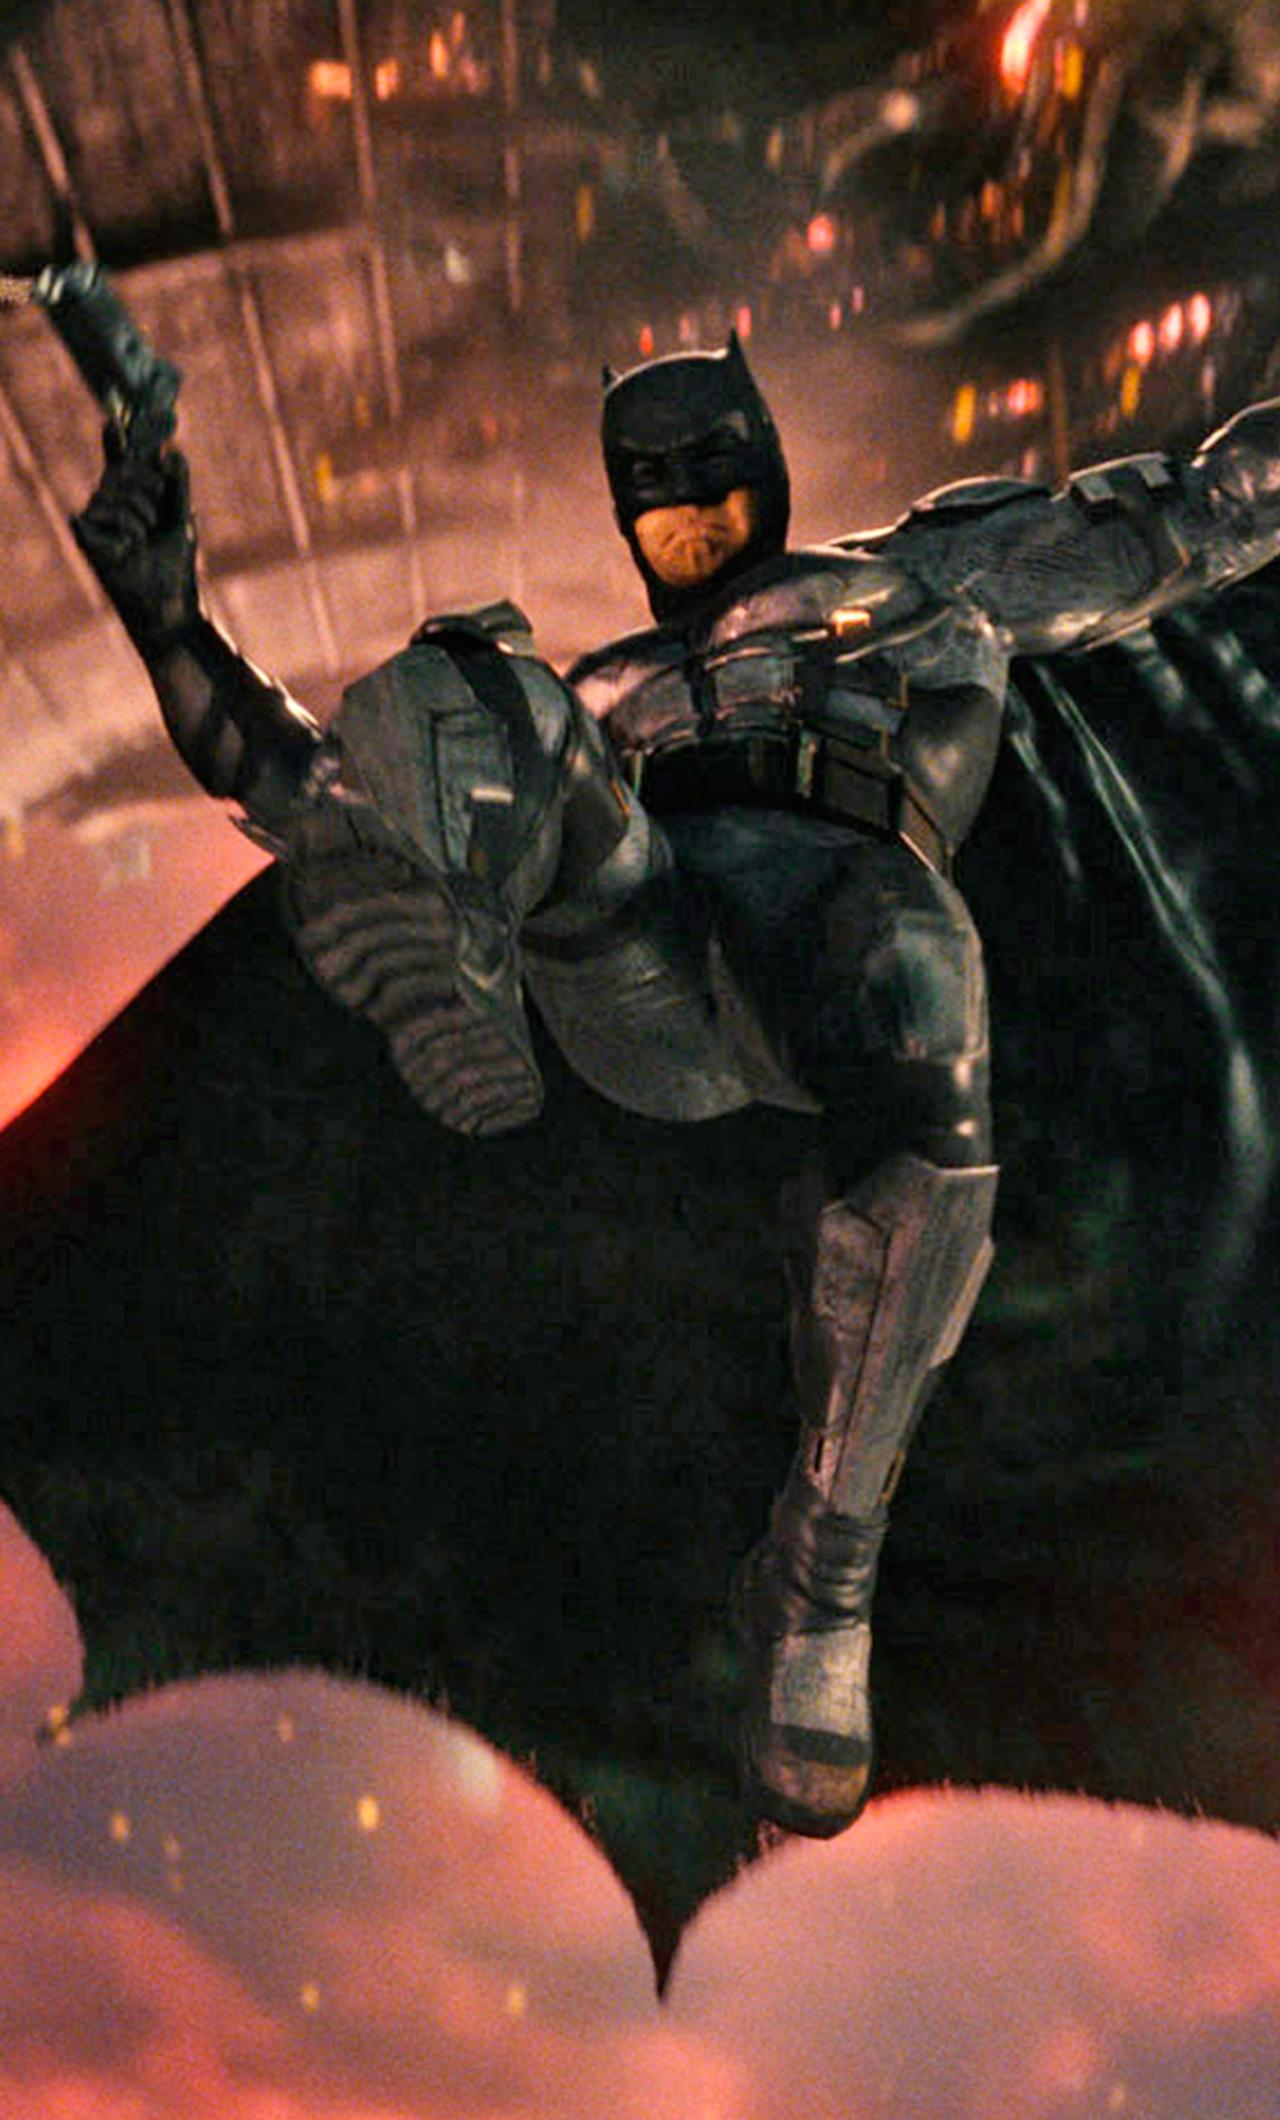 Batman Justice League 2017 Movie 6r